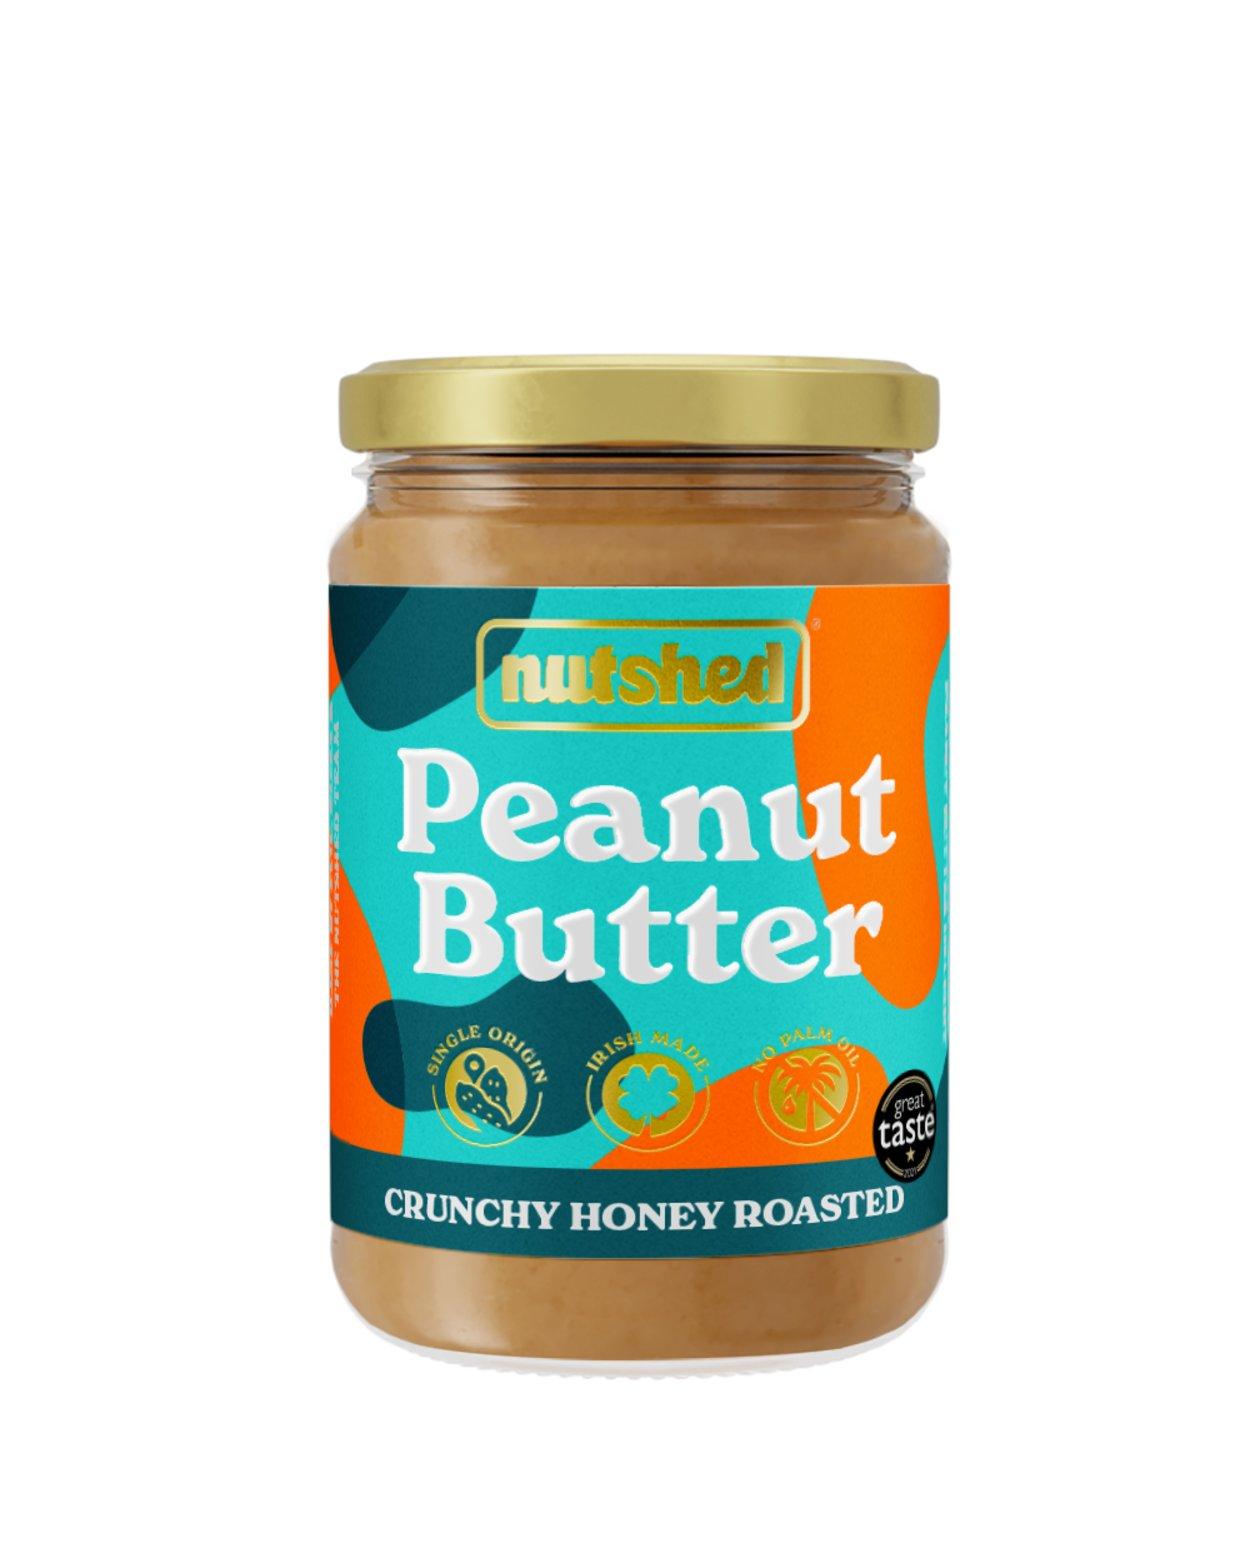 Nutshed Honey Roasted Crunchy Peanut Butter